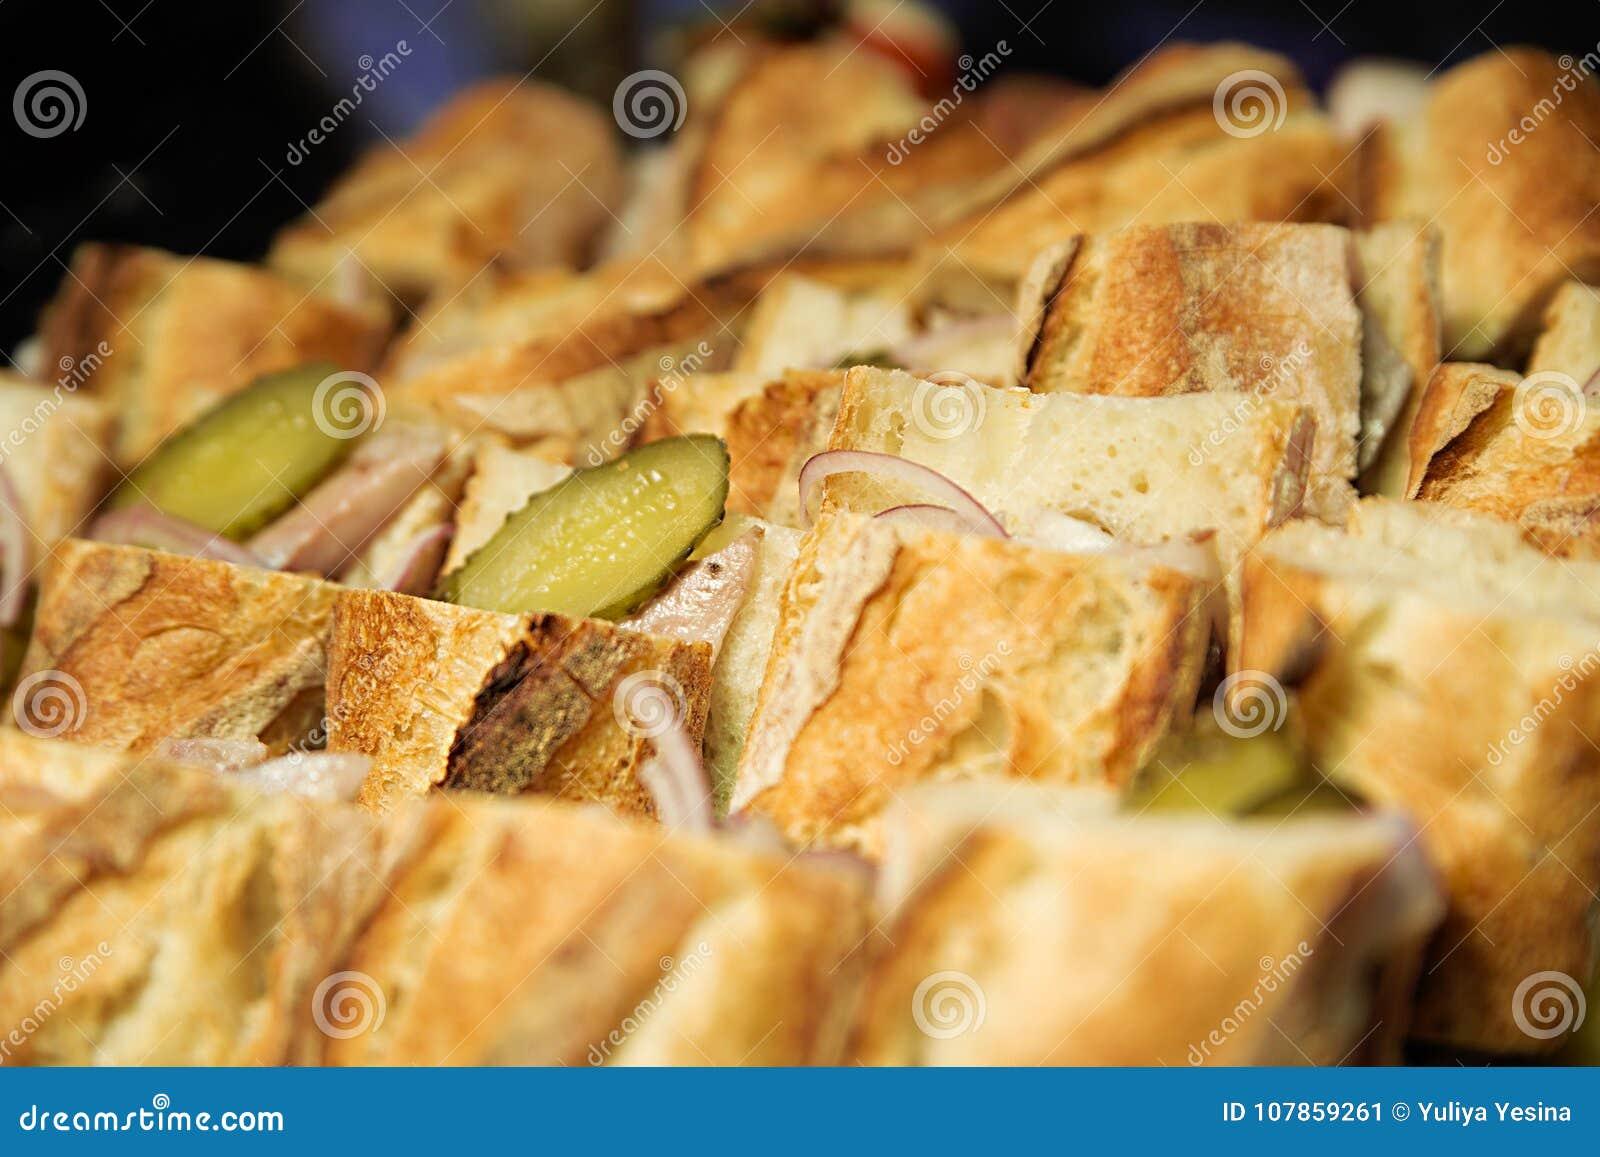 Sandwiches met ingelegde komkommer, ham en uien